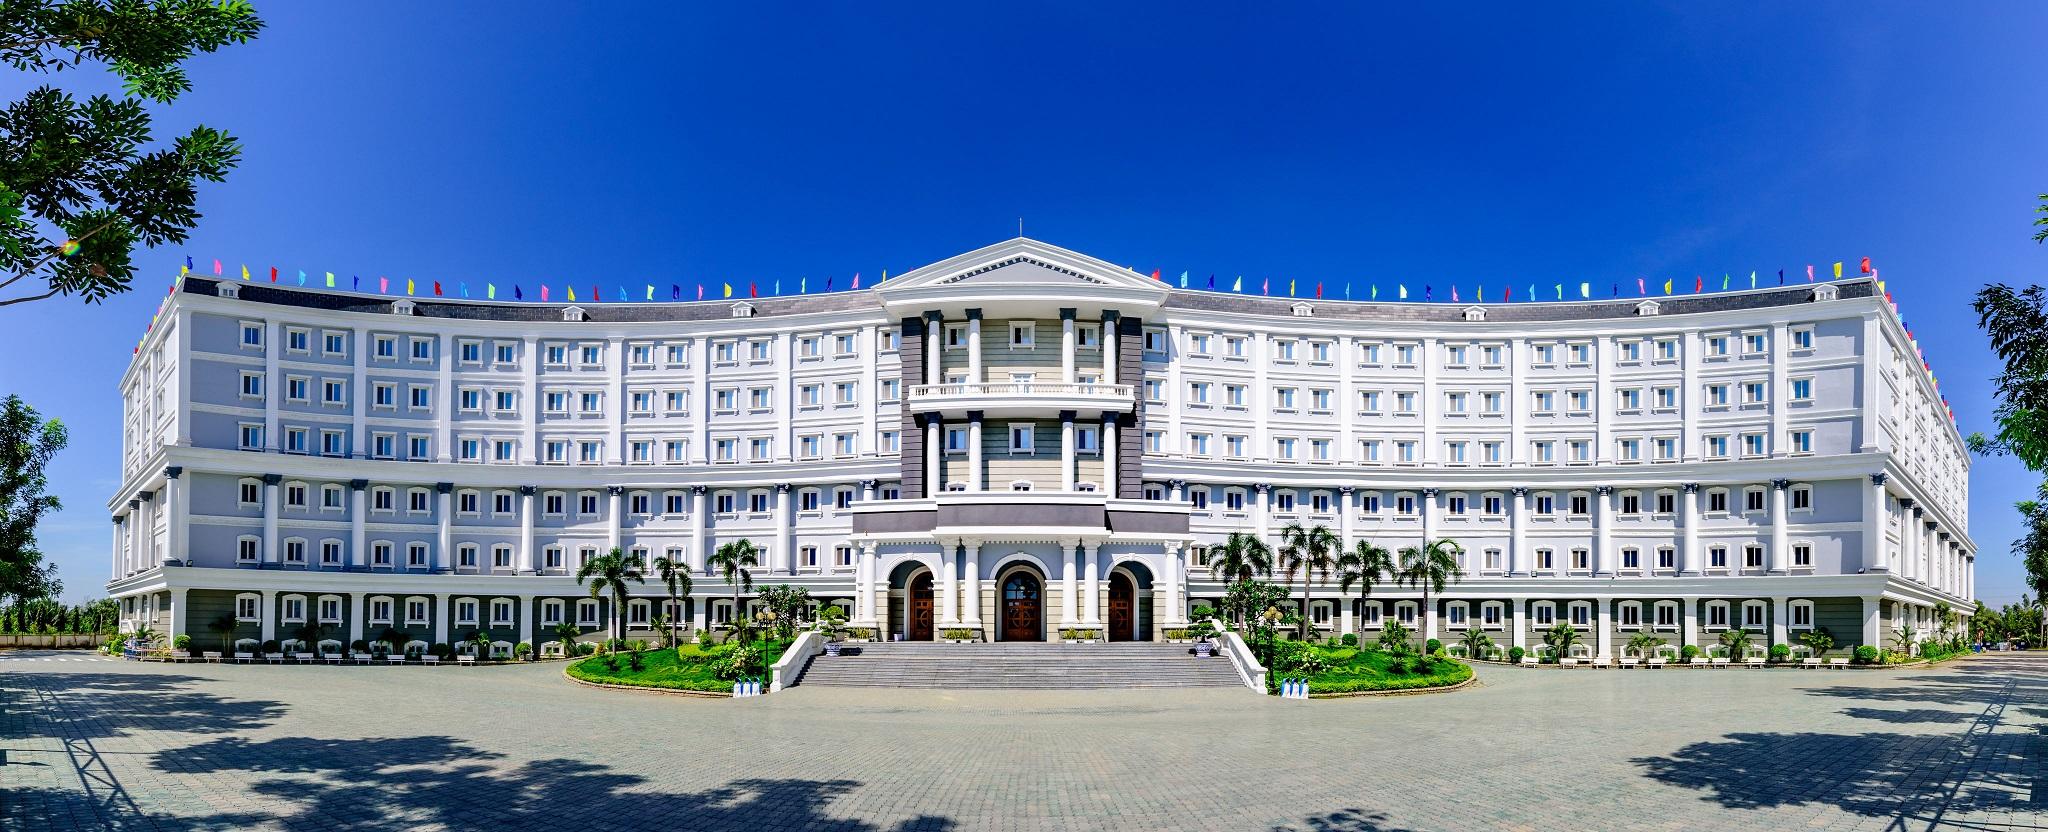 American International School Vietnam (AISVN)